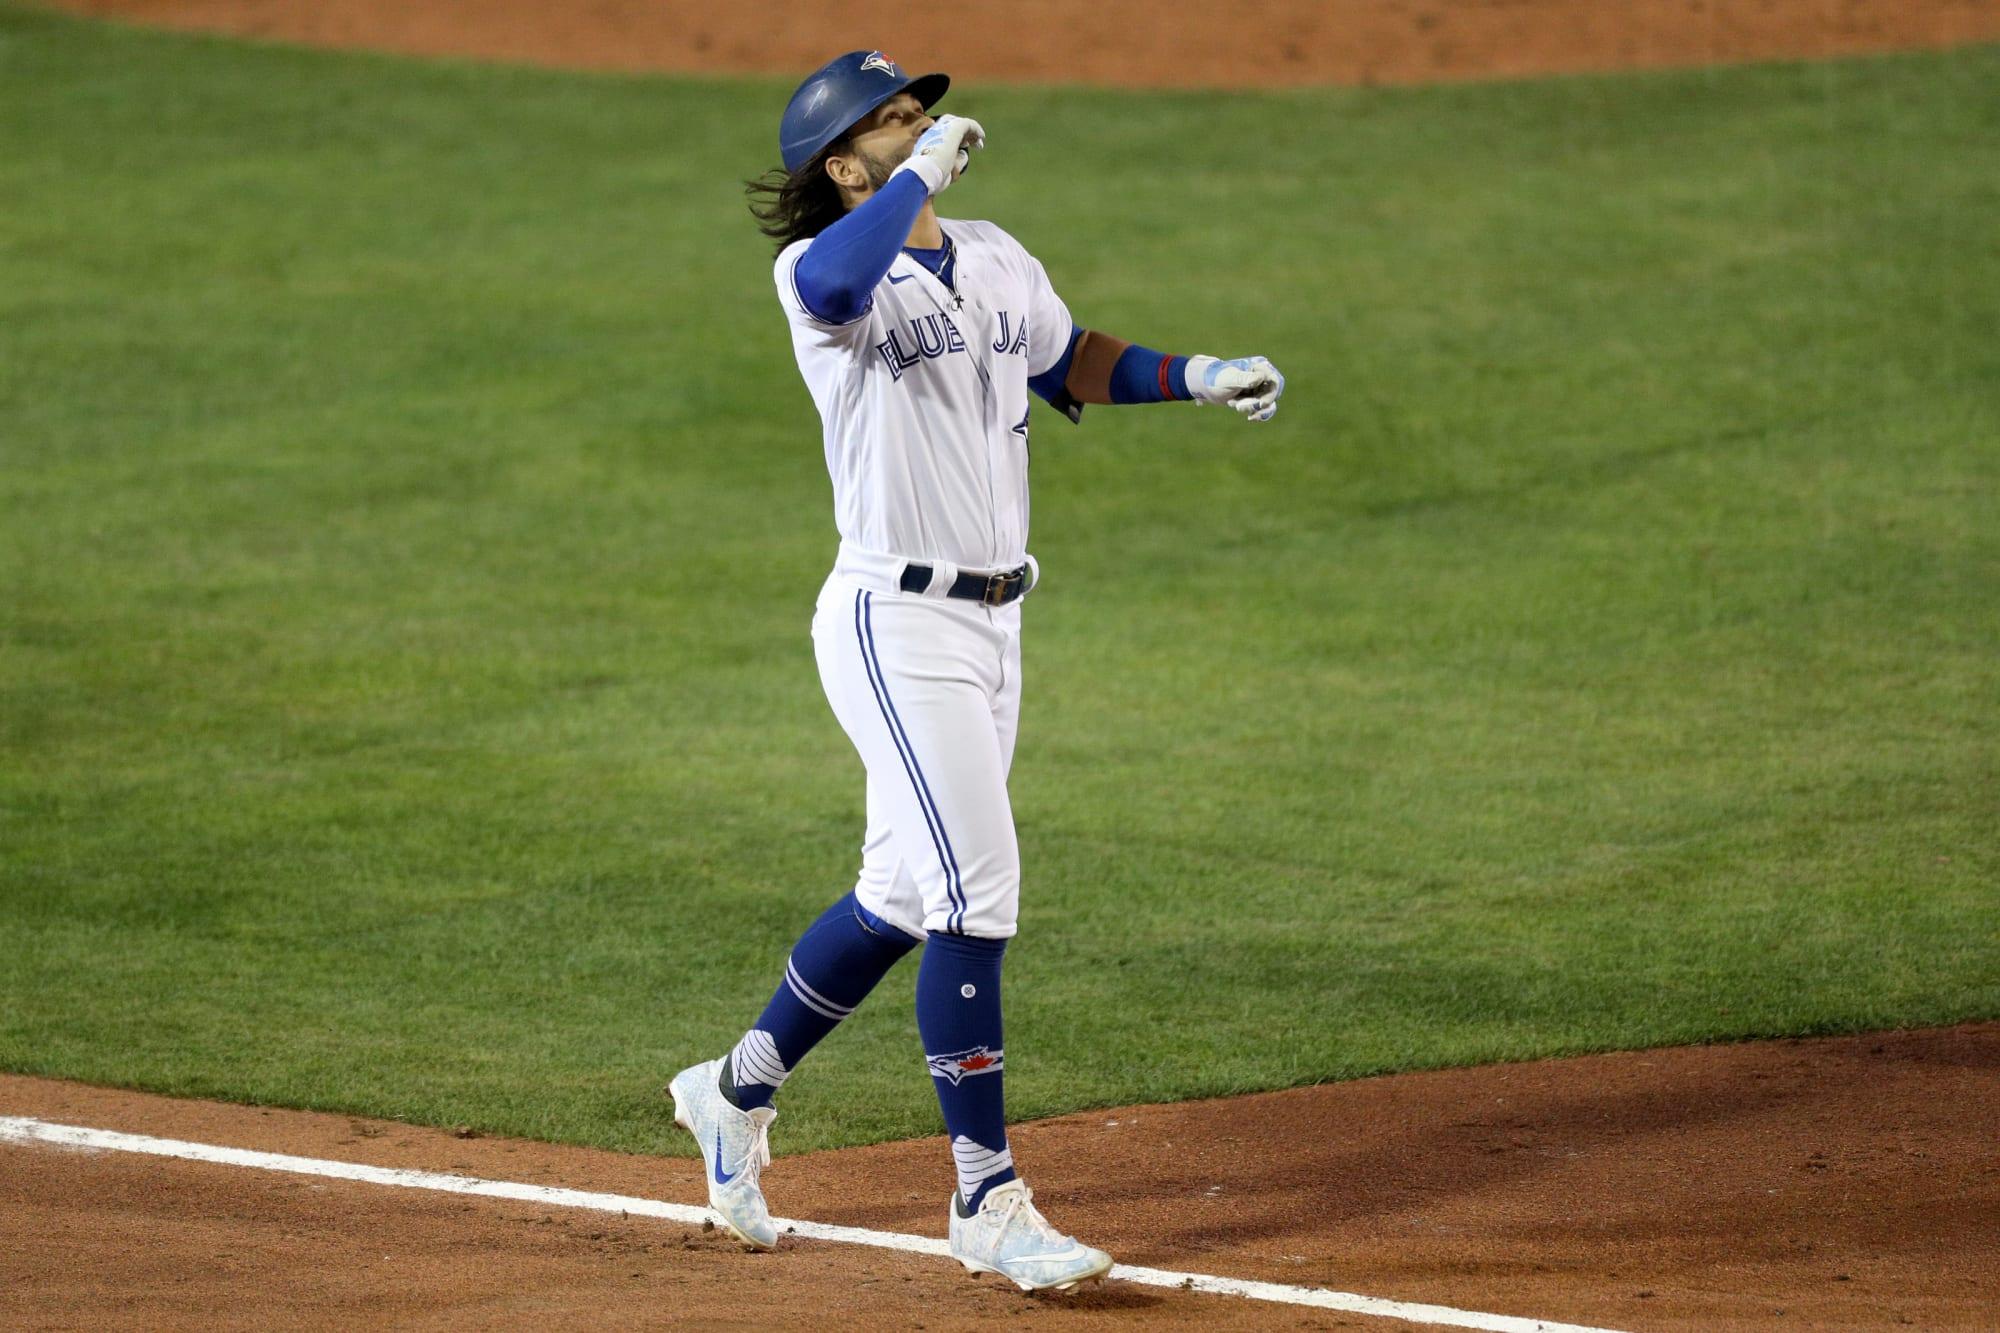 Toronto Blue Jays: Bo Bichette showcasing superstar potential